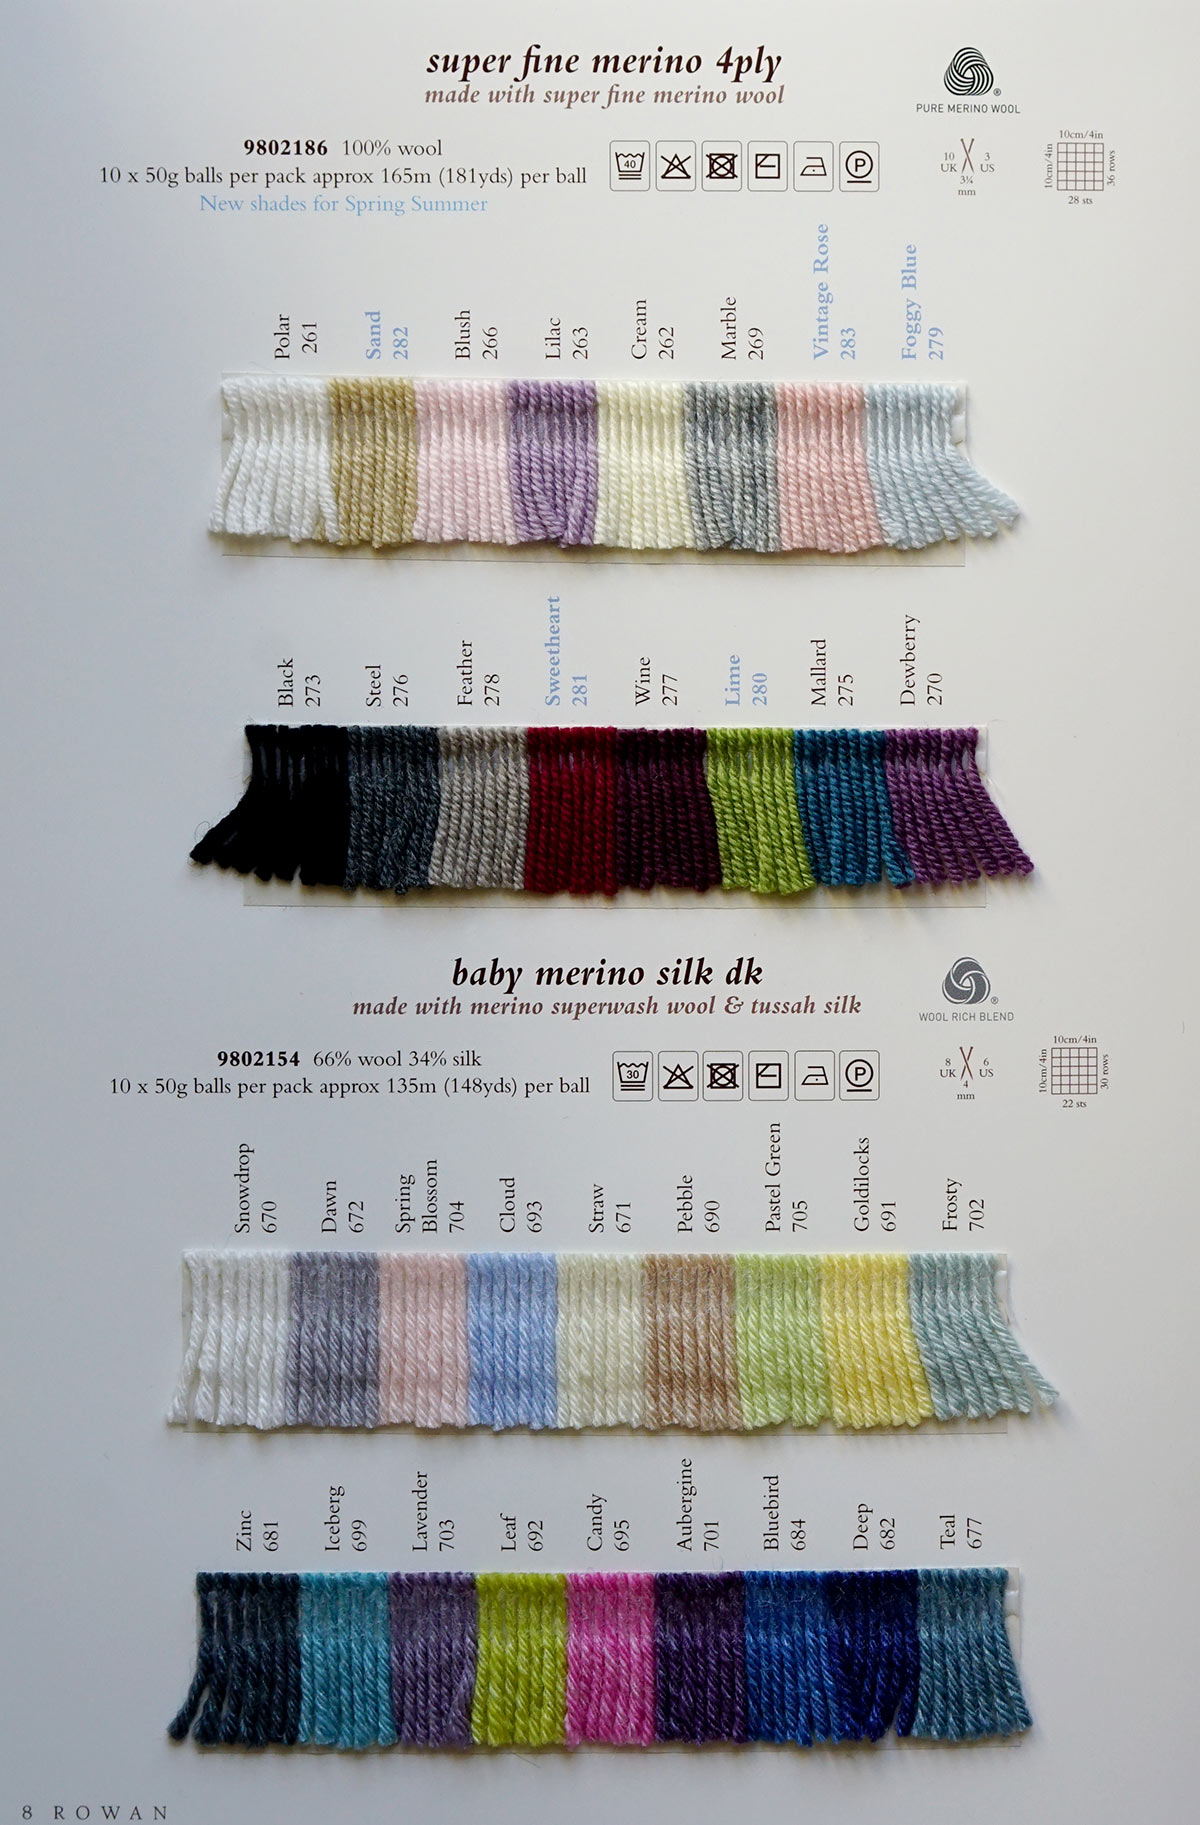 44dfd537cfd Rowan Baby Merino Silk DK - Rowan Yarns RYC Sirdar Sublime English ...